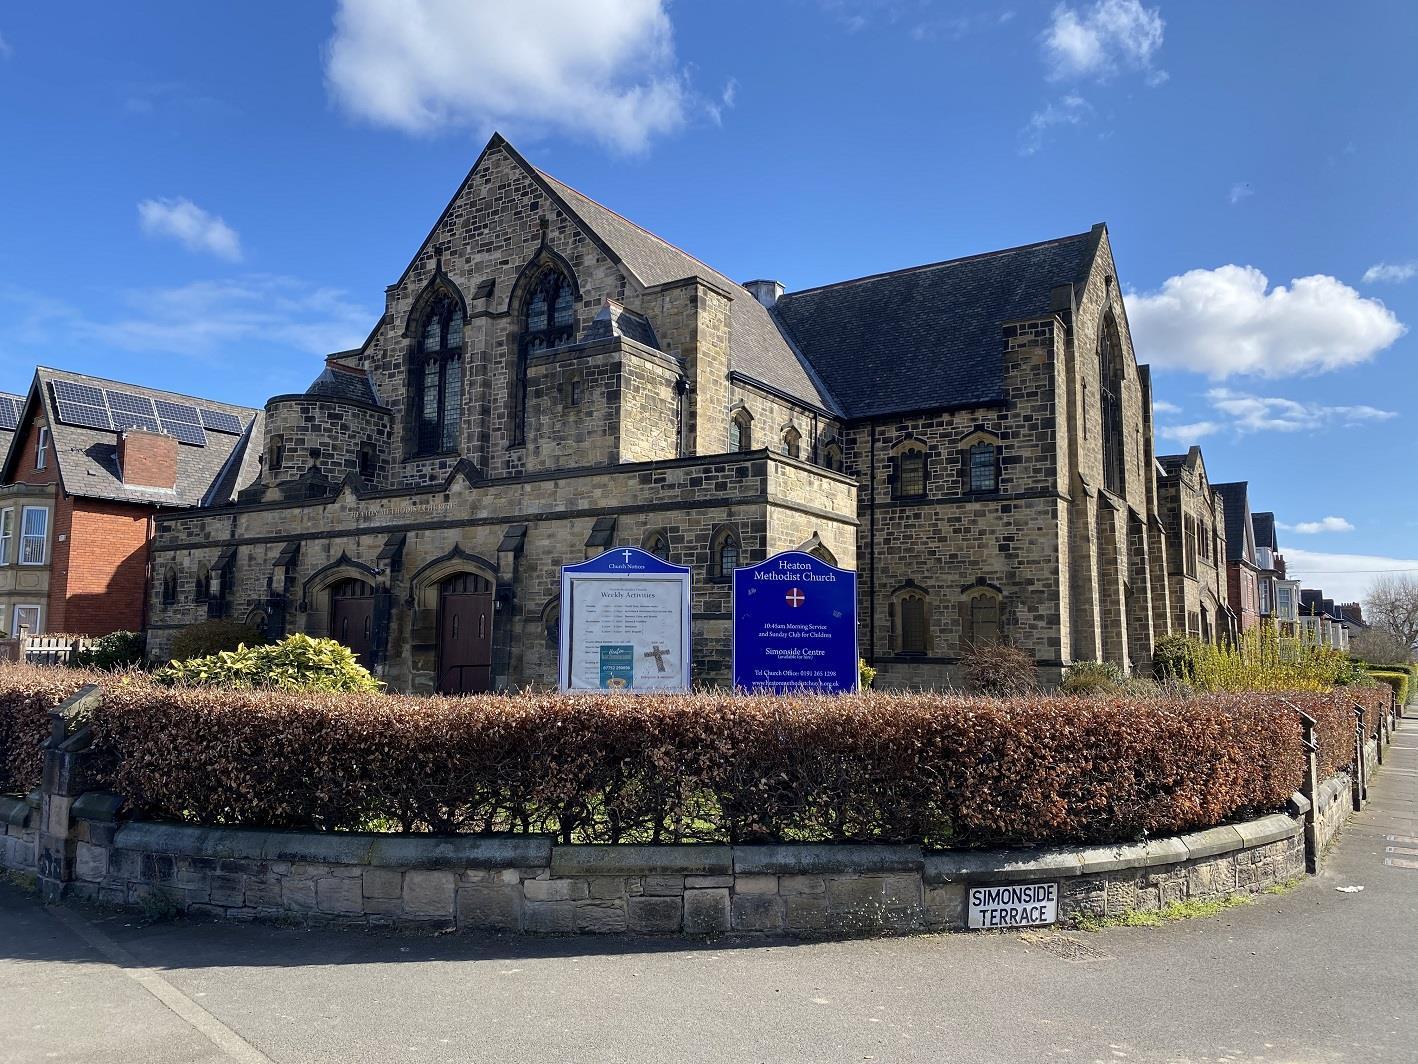 Heaton Methodist Church, 7 Simonside Terrace, Newcastle Upon Tyne, North East, NE6